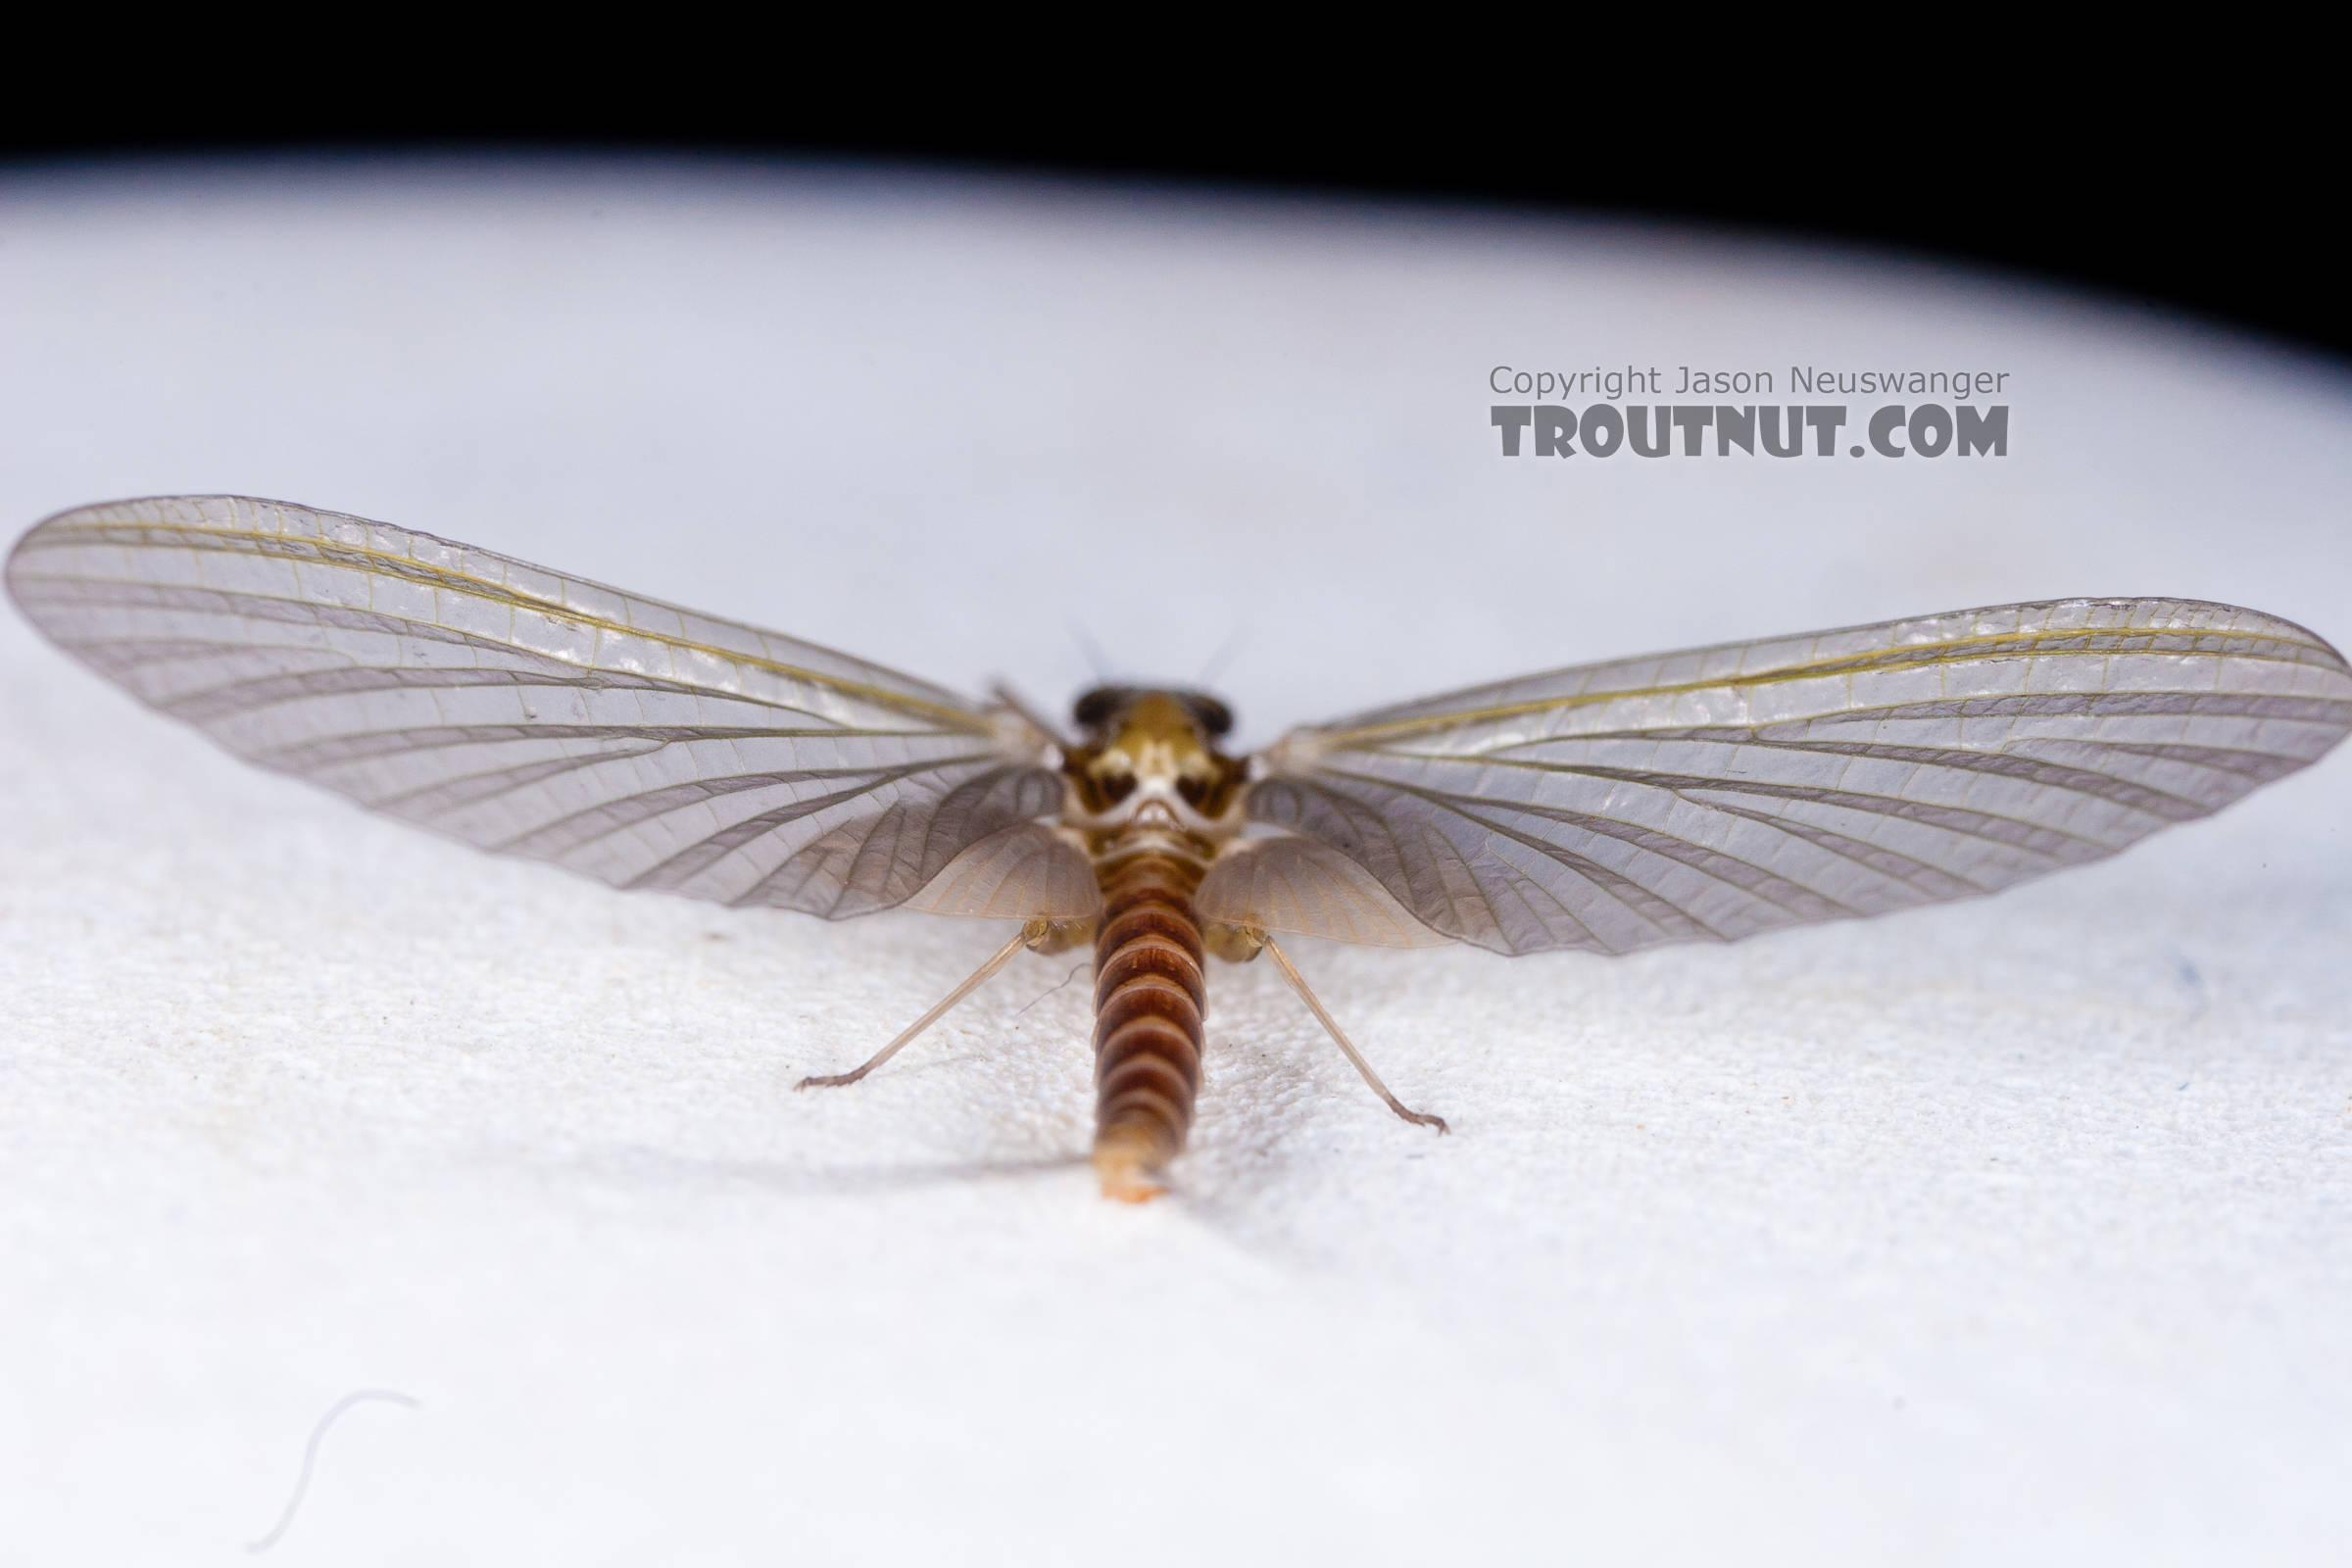 Female Cinygmula (Dark Red Quills) Mayfly Dun from the Gulkana River in Alaska